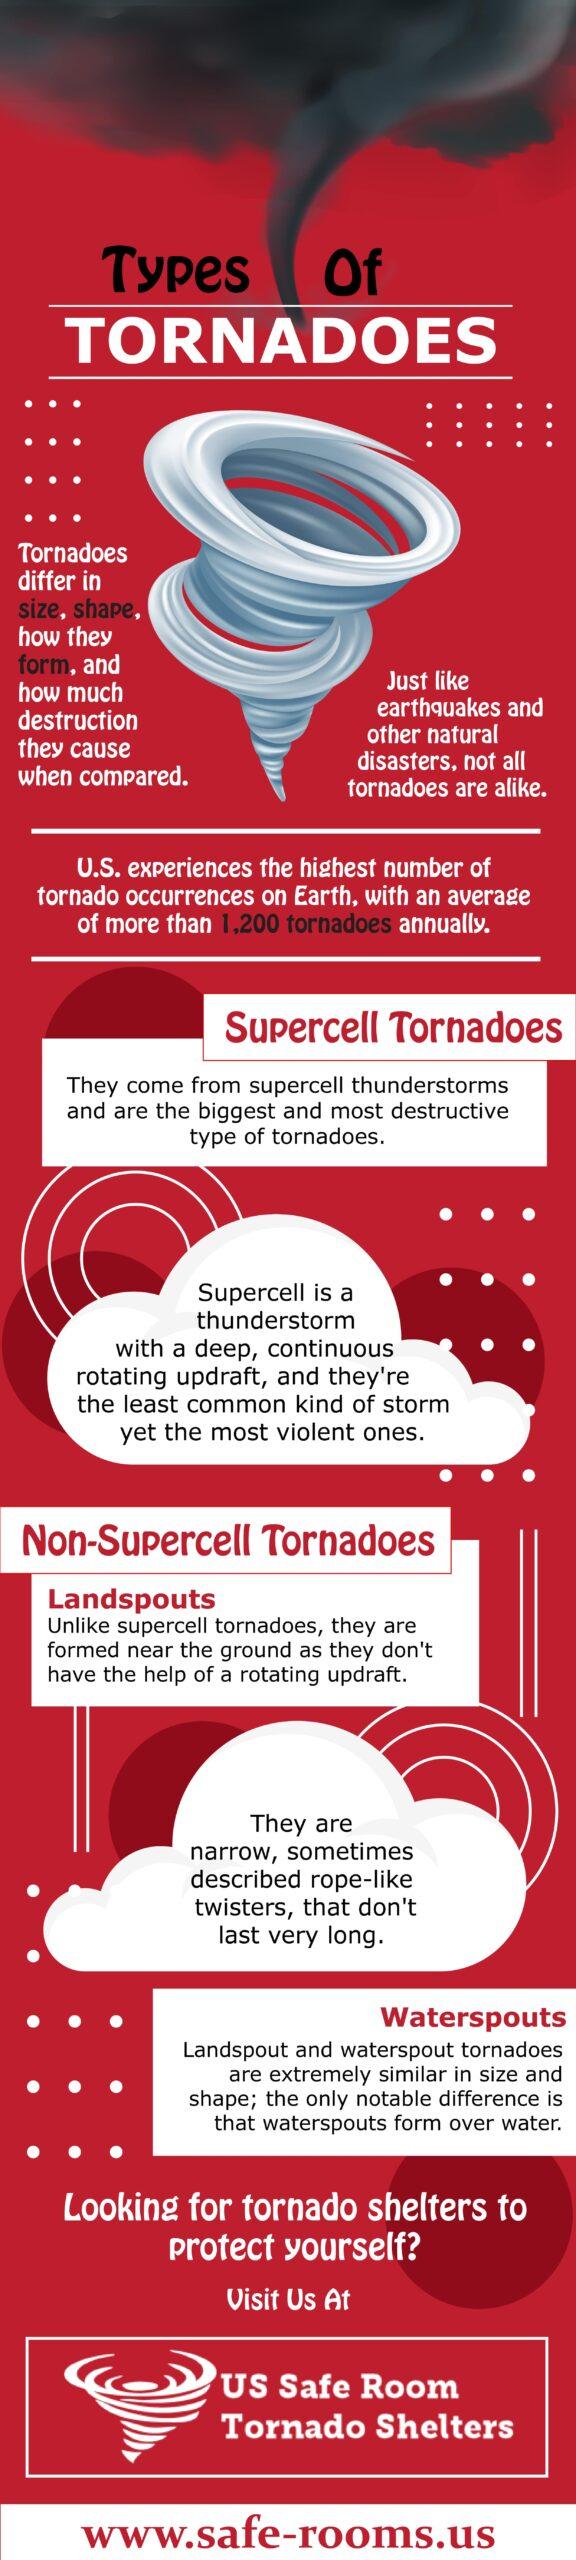 tornado types